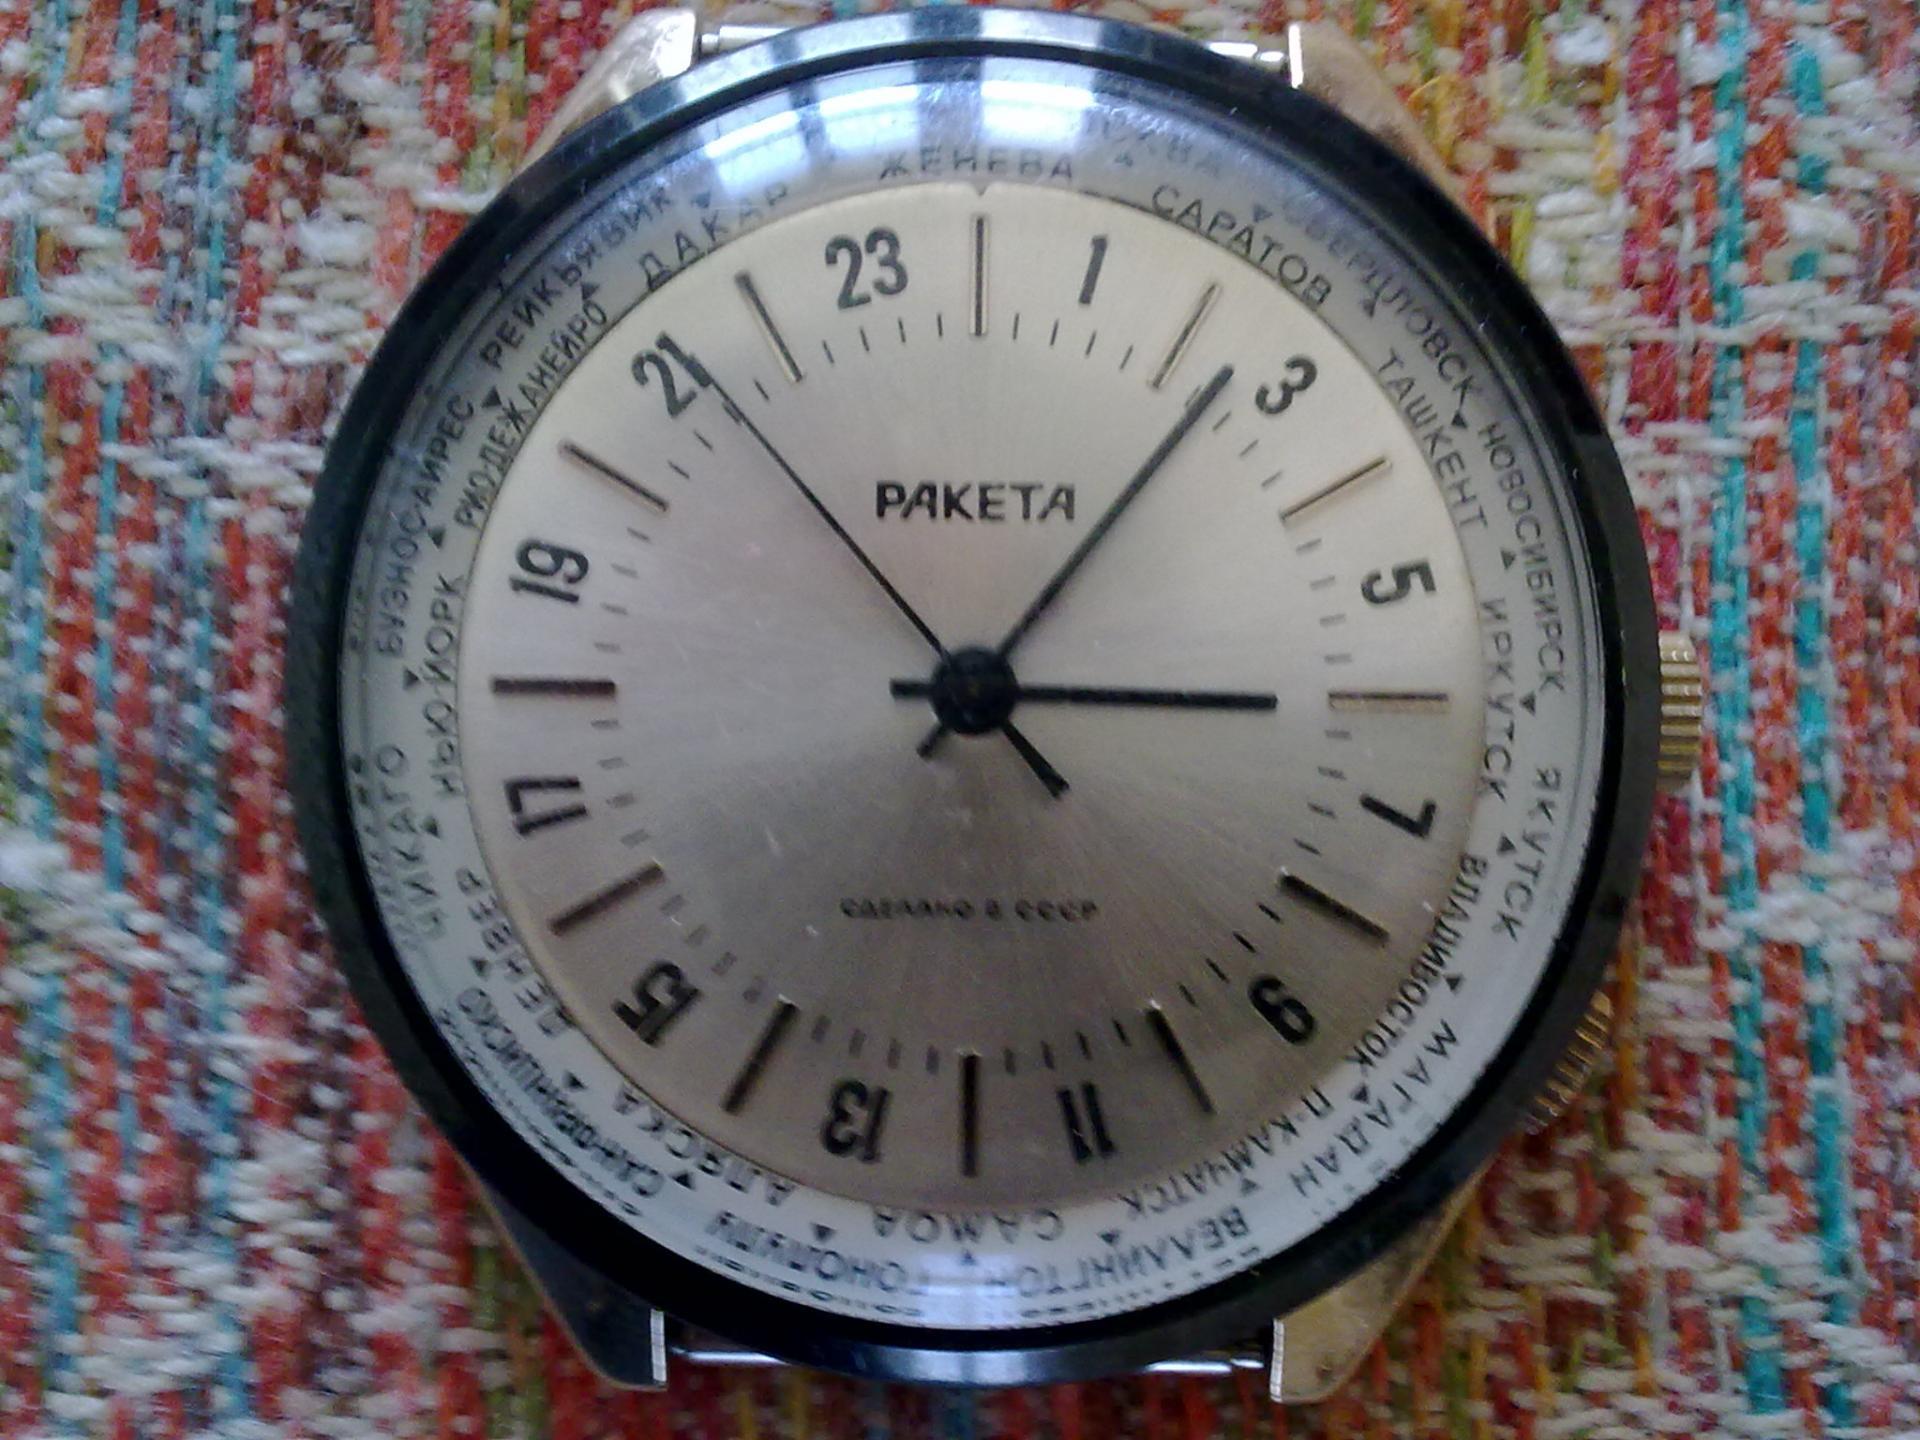 Naziv: RAKETA-1.jpg, pregleda: 422, veličina: 307,1 KB